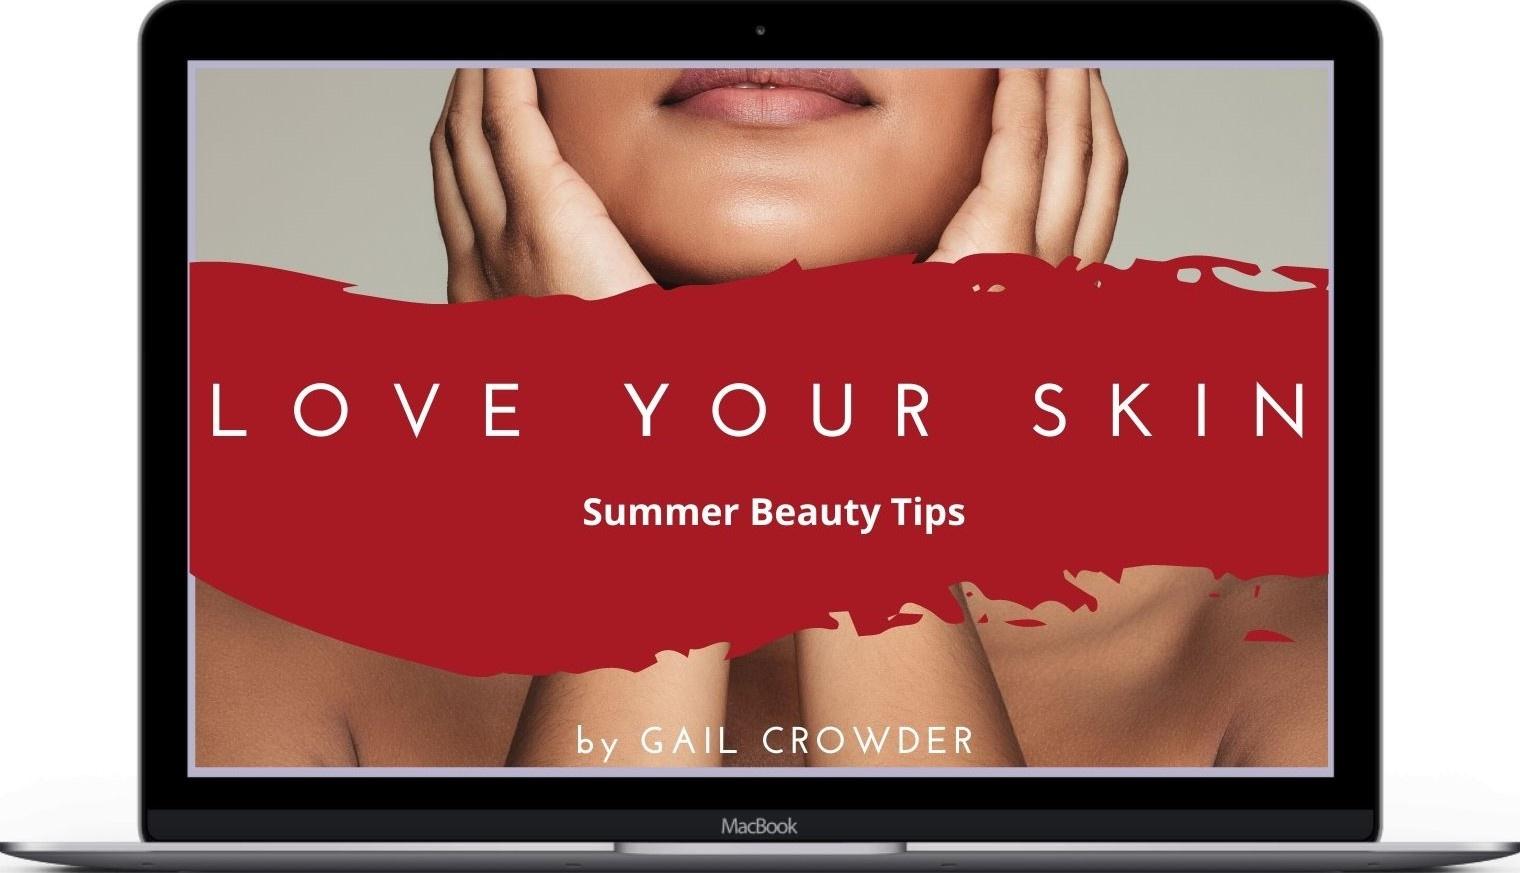 Love Your Skin: Summer Beauty Tips Ebook